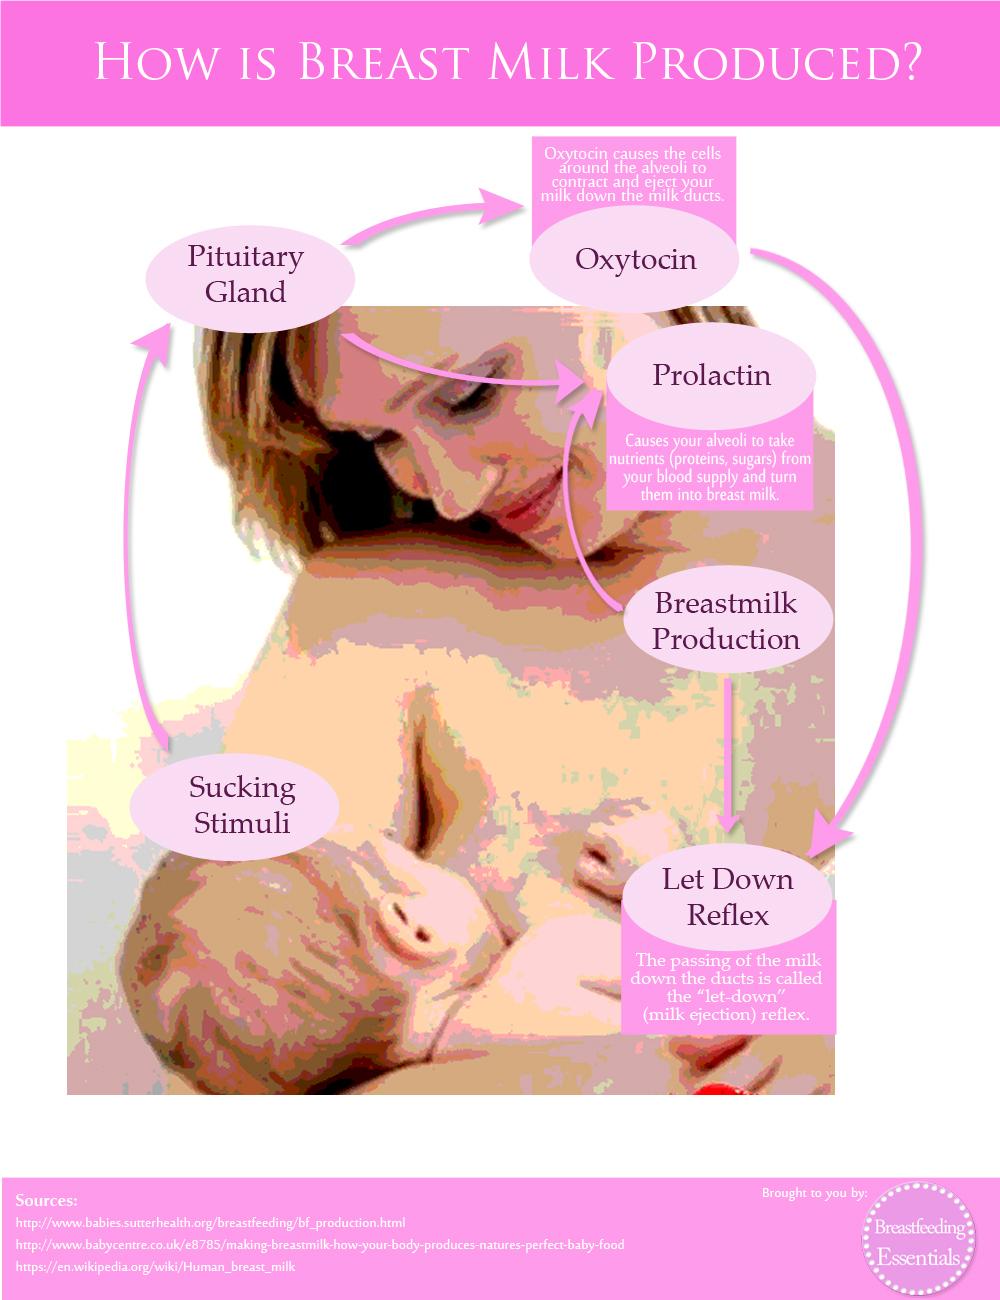 Prolactin Breast Milk 22